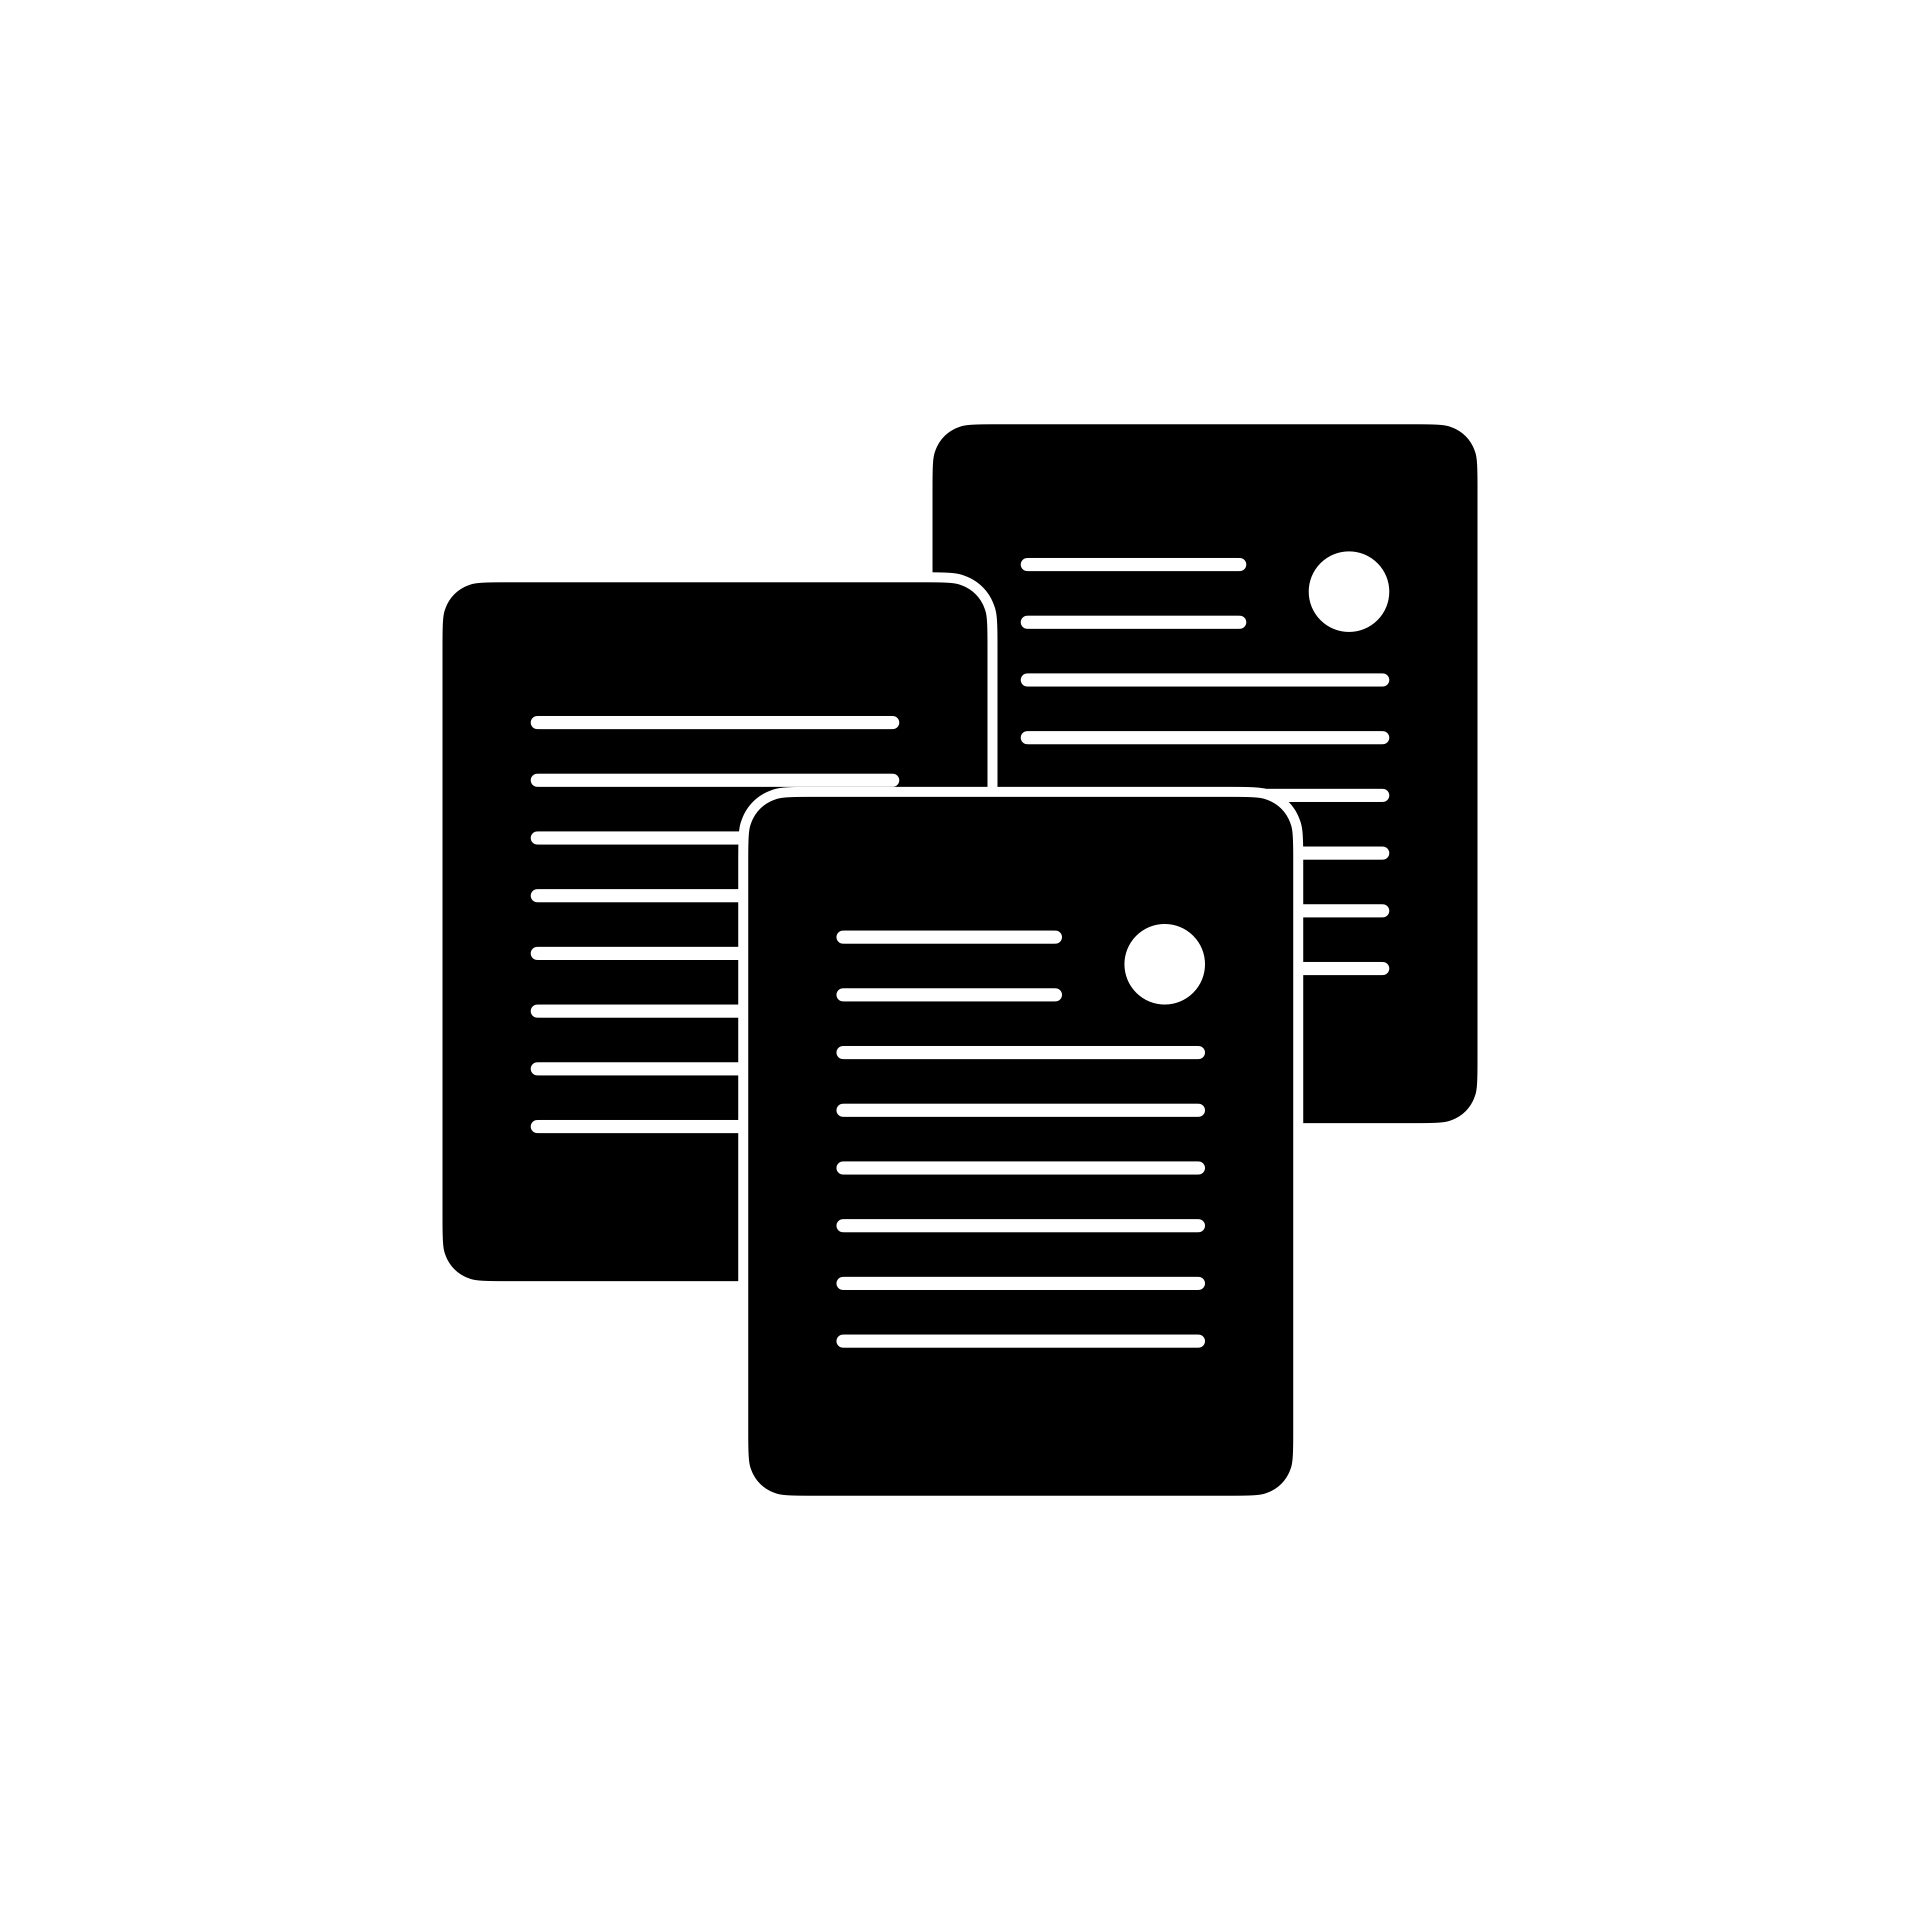 Templates - Icon